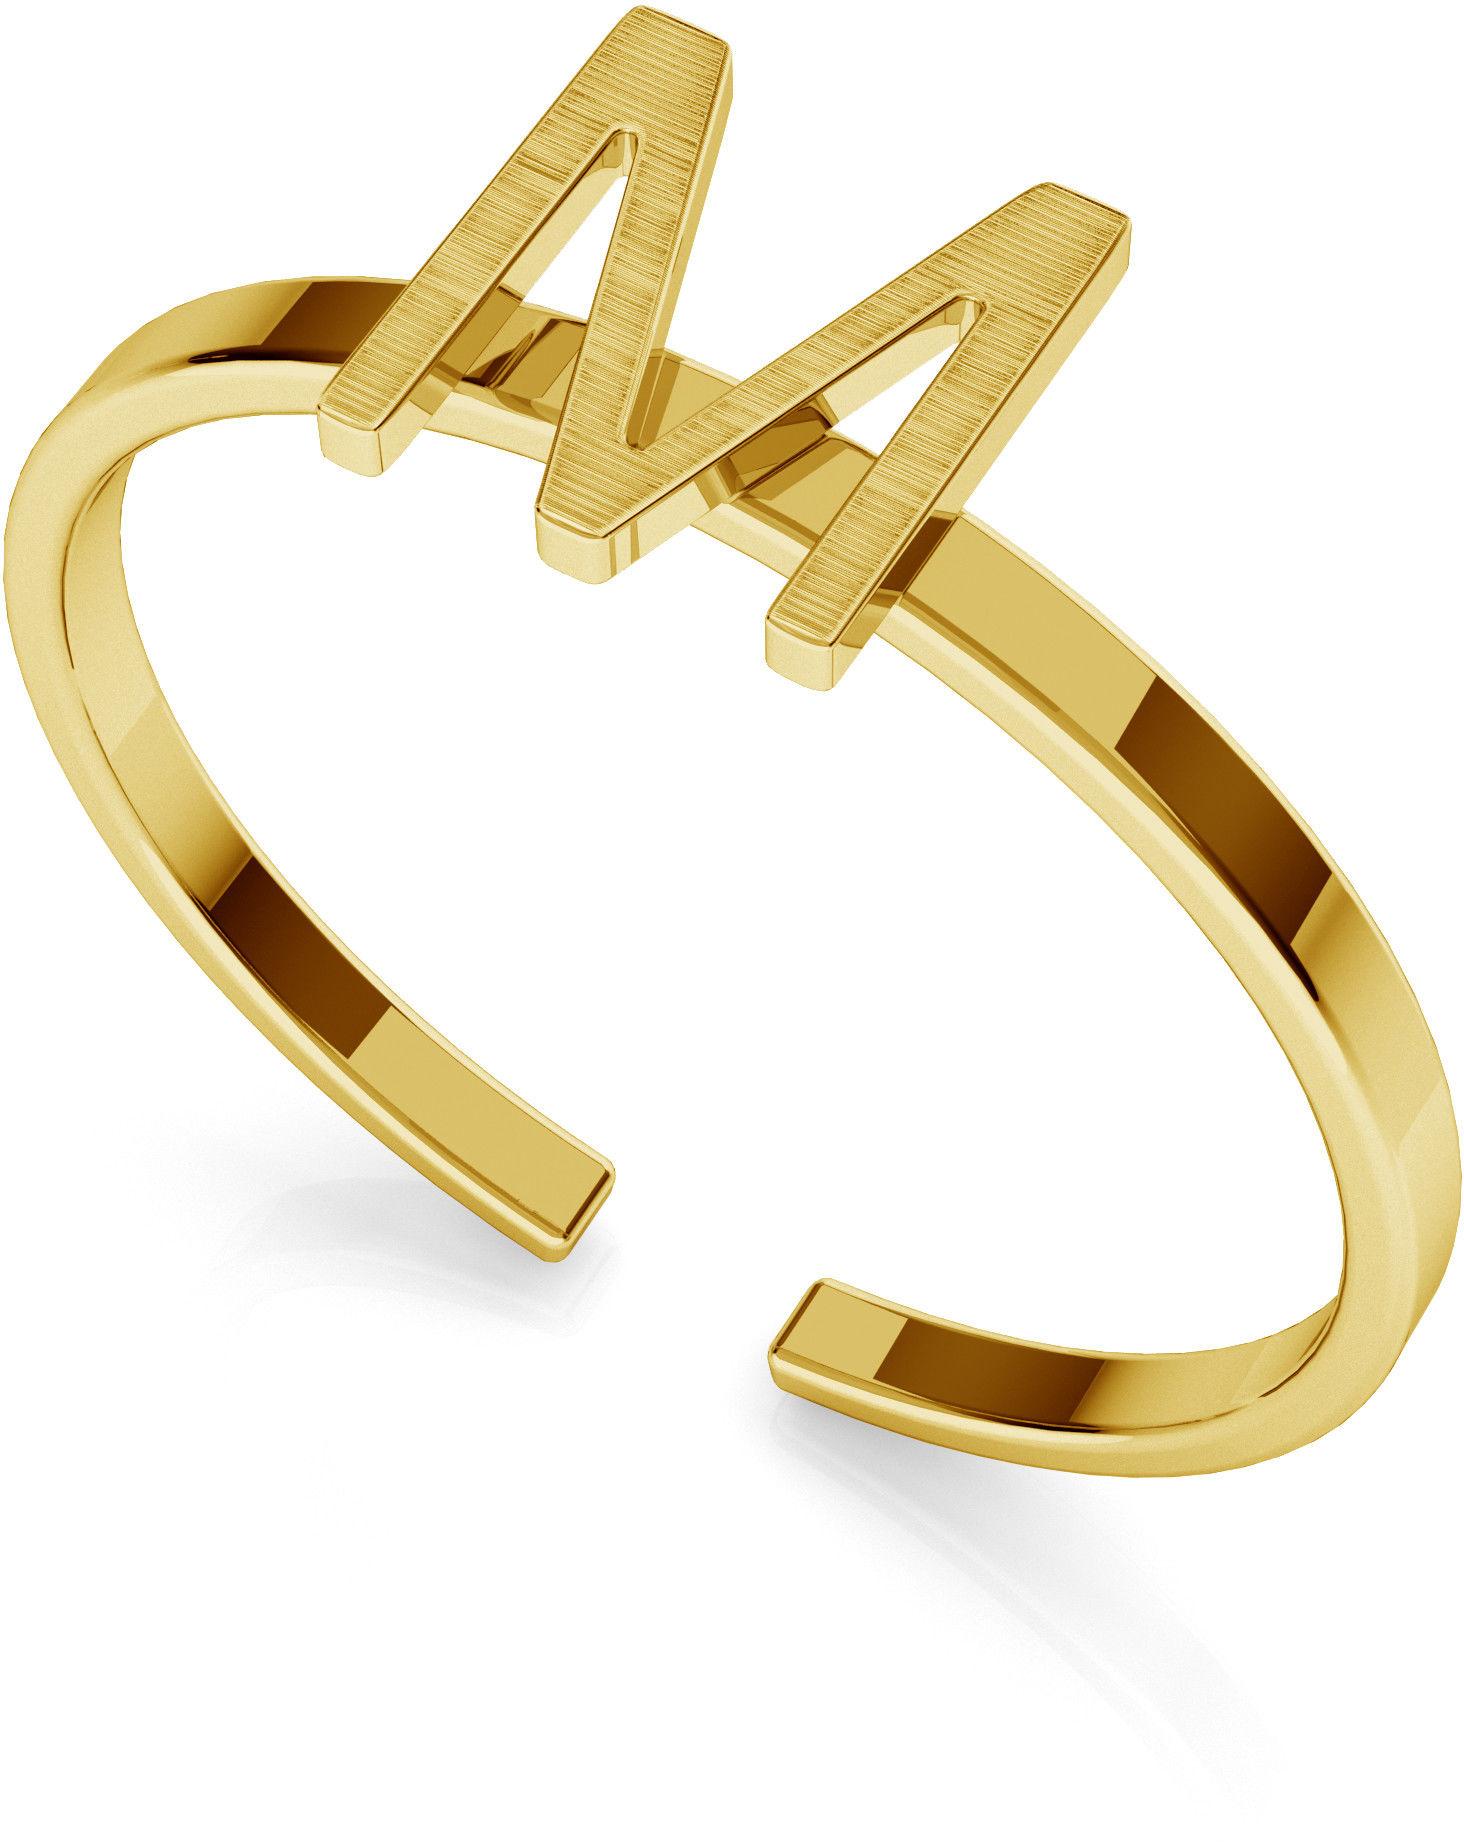 Srebrny pierścionek z literką My RING, srebro 925 : Litera - F, Srebro - kolor pokrycia - Pokrycie platyną